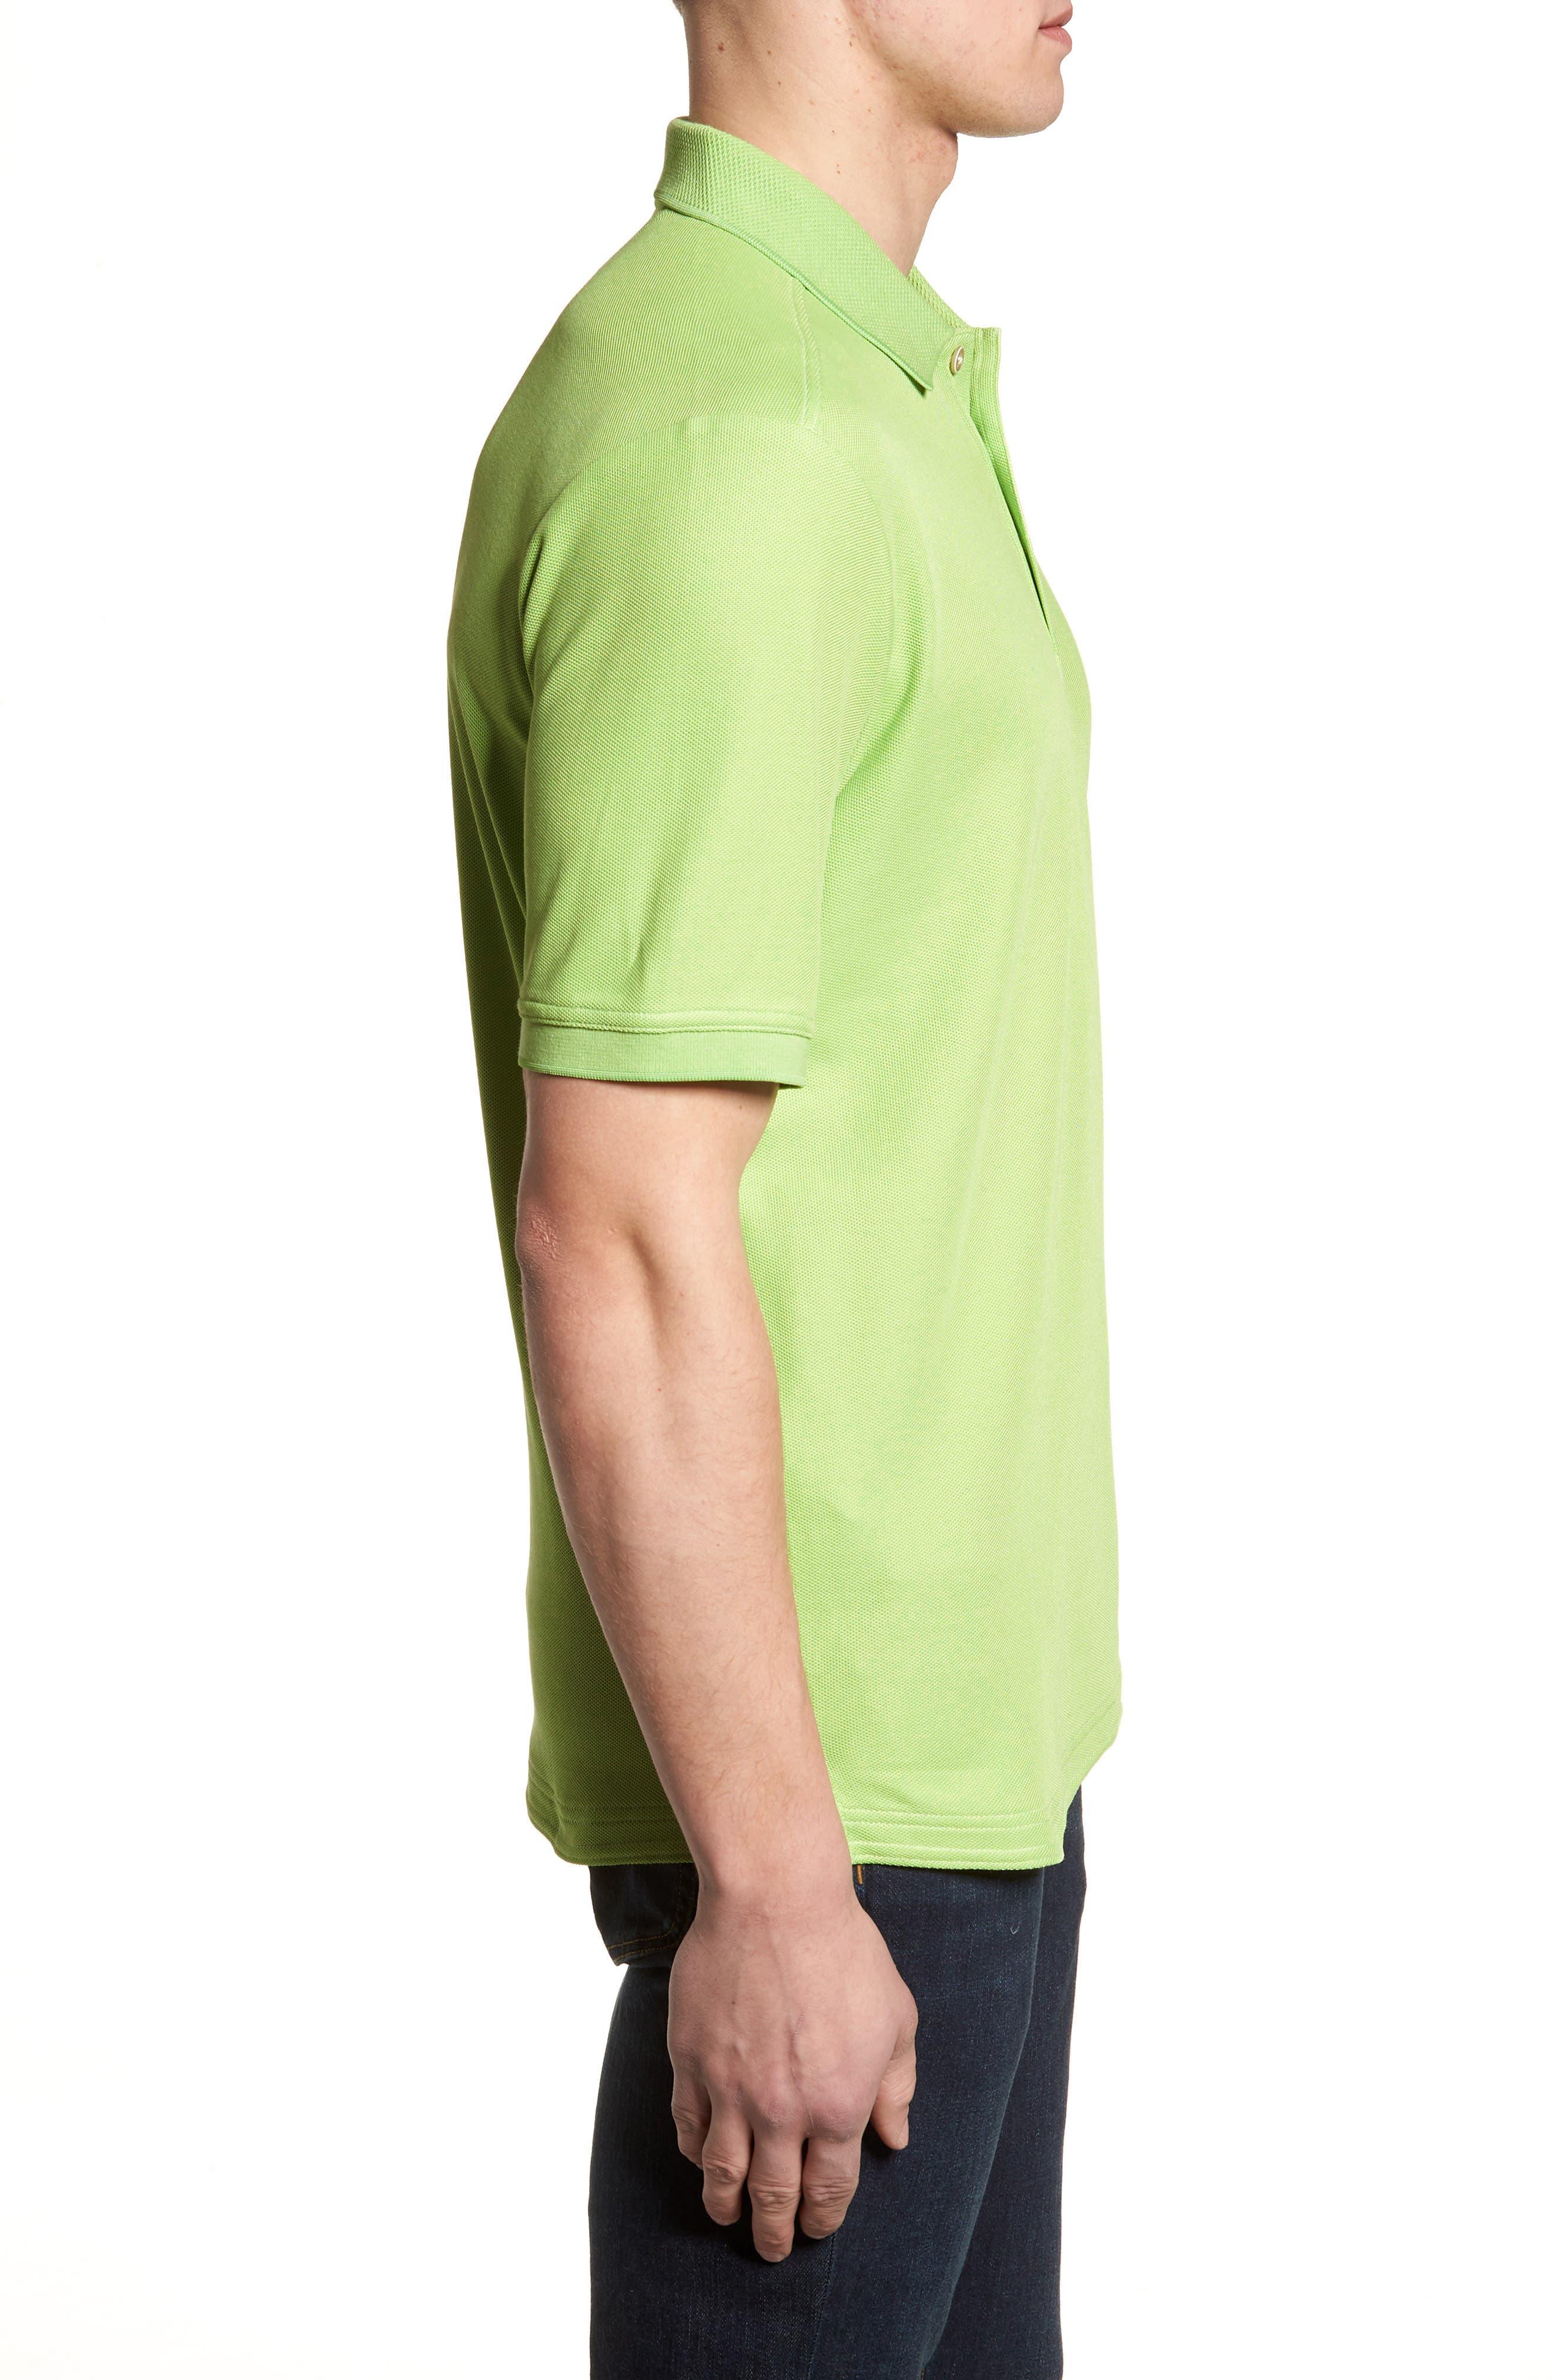 'The Emfielder' Original Fit Piqué Polo,                             Alternate thumbnail 5, color,                             Caicos Green